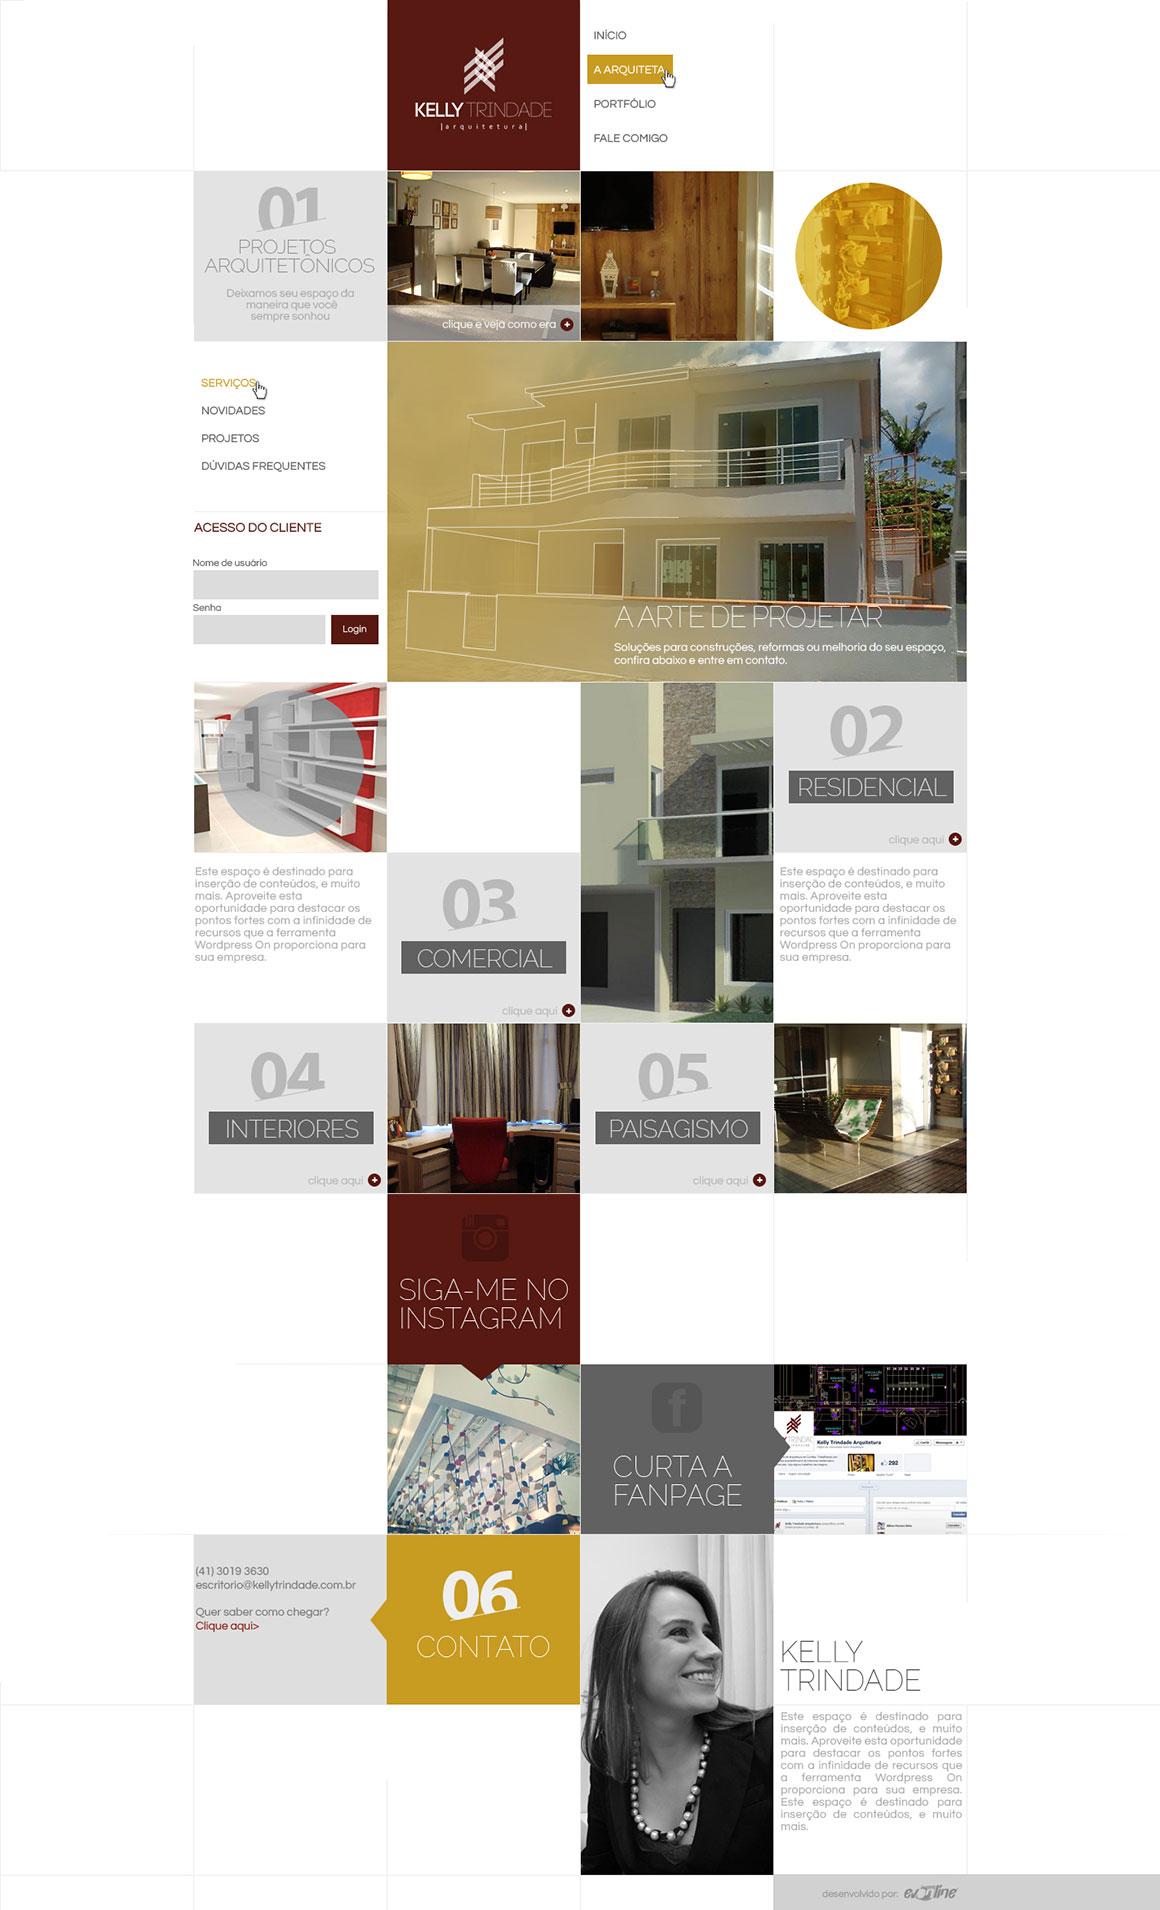 layout-kelly1